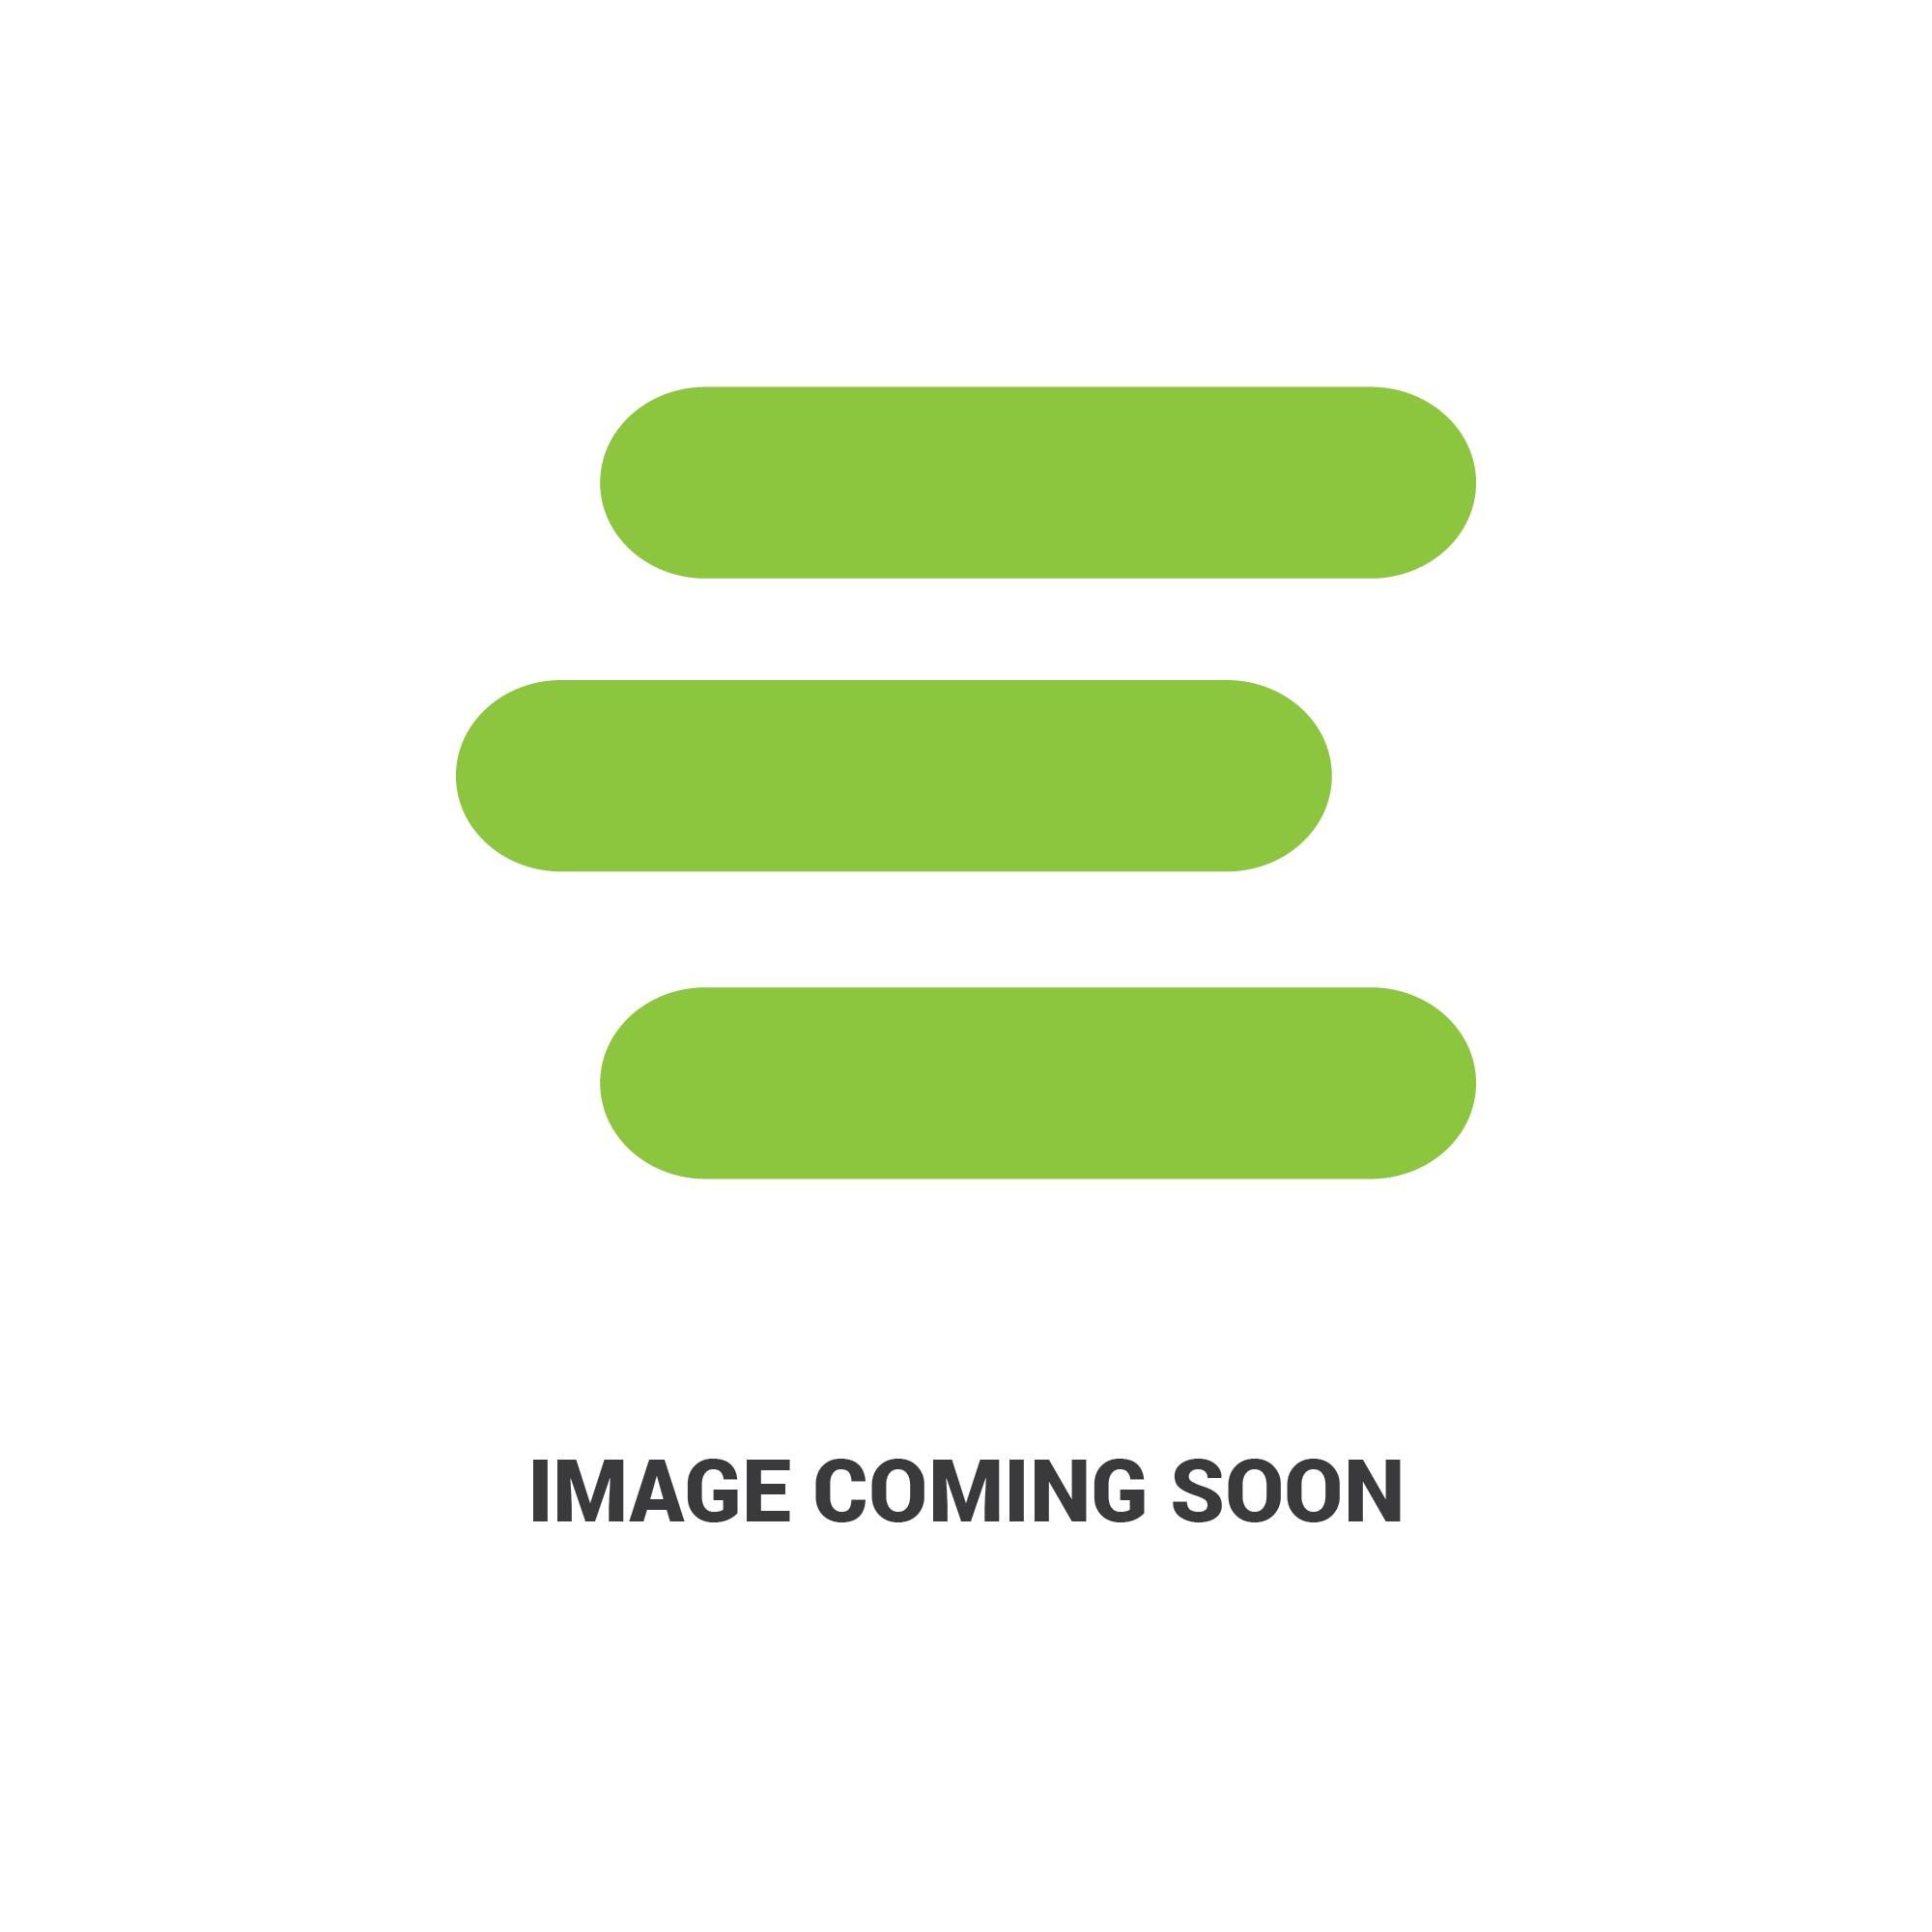 E-70000-740341968_1.jpg